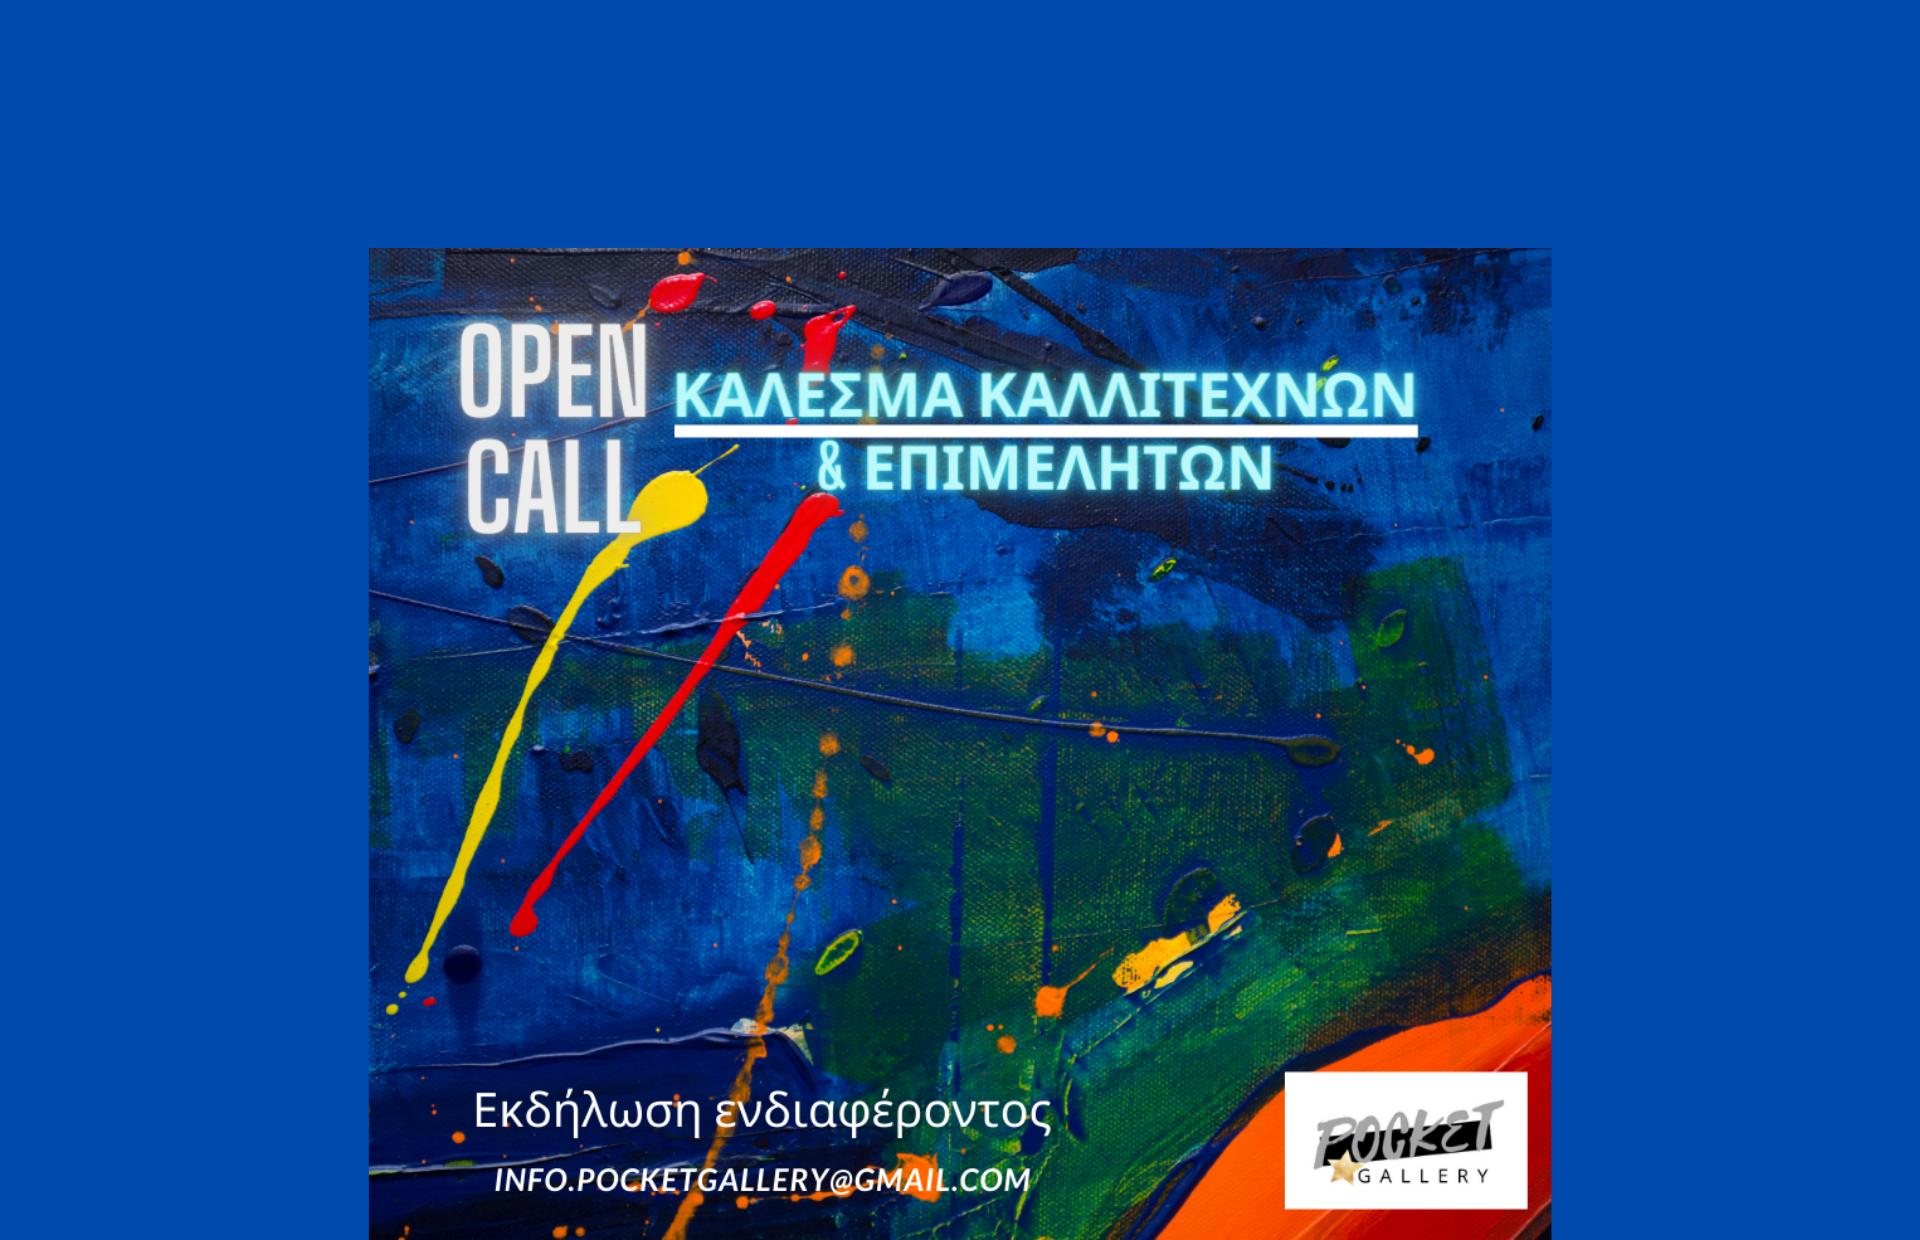 Open call: Κάλεσμα καλλιτεχνών και επιμελητών